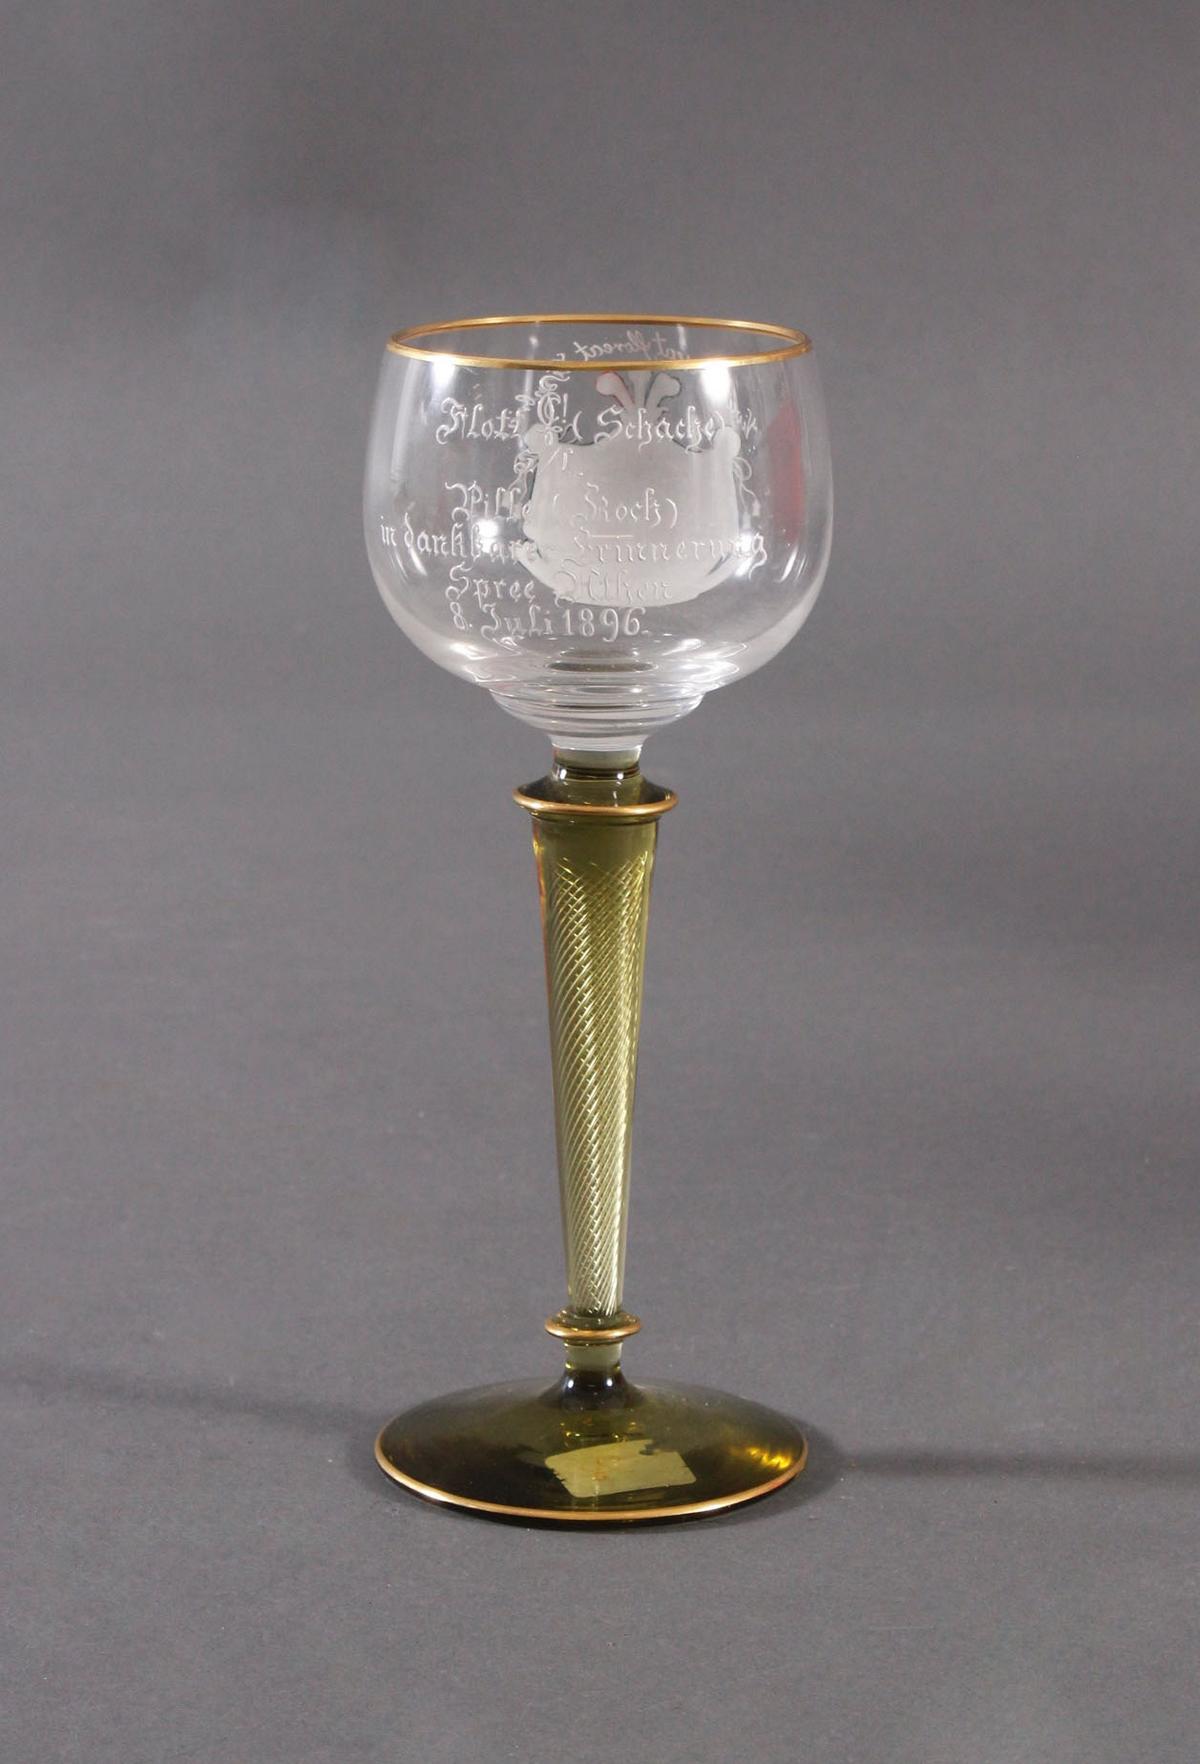 Andenkenglas, Verbindungsglas um 1900-4